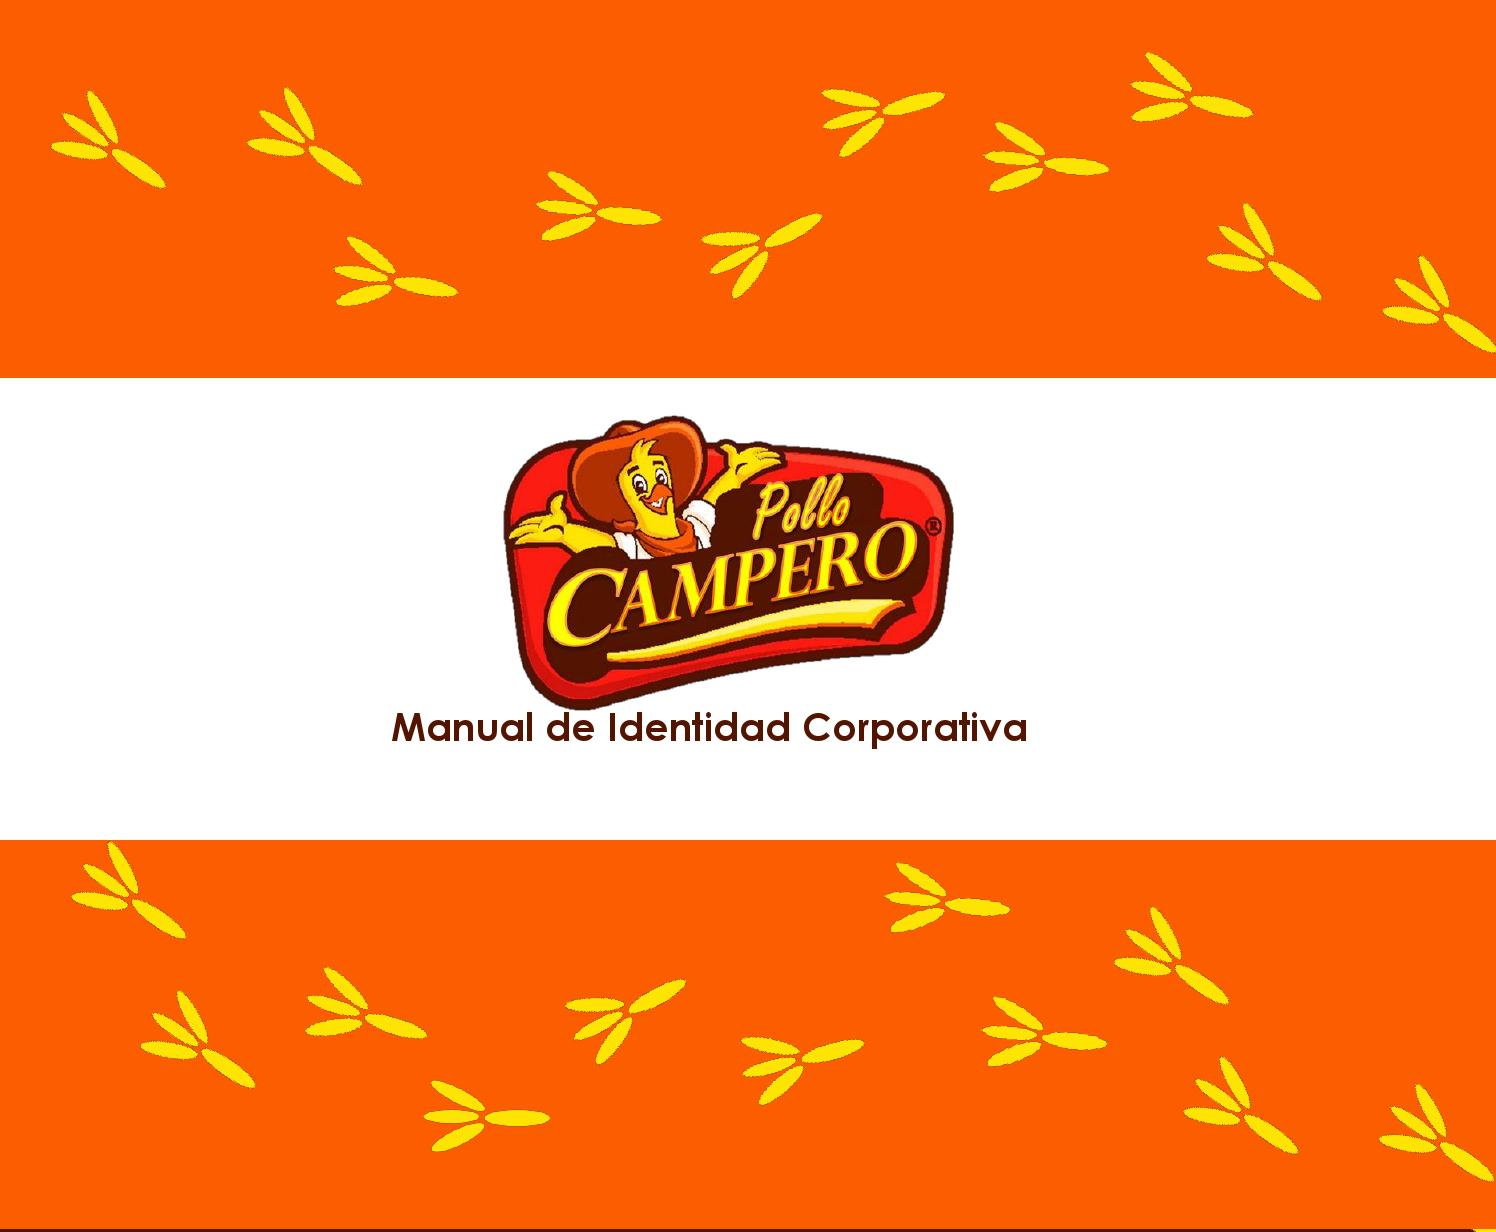 Manual de identidad corporativa pollo campero by Rossmary Zepeda - issuu